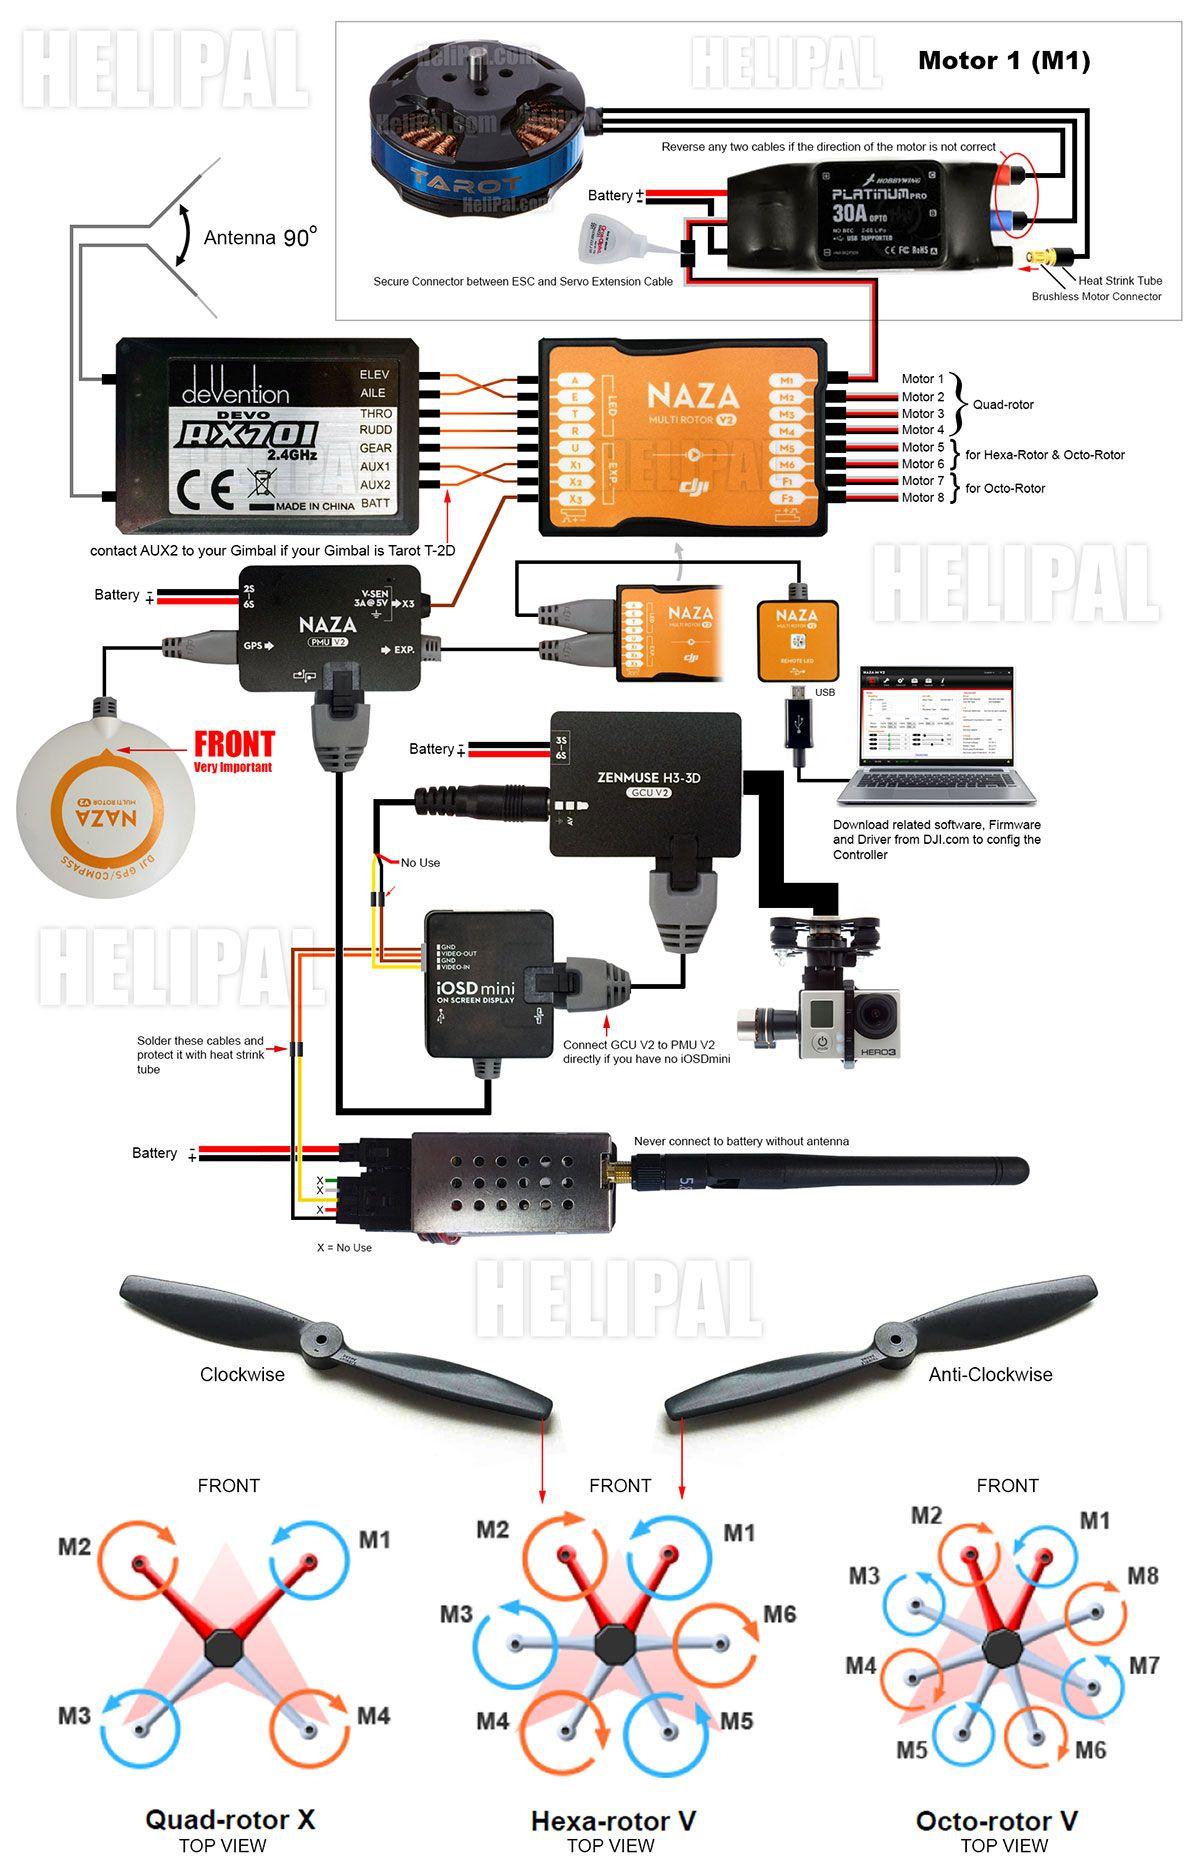 fpv racing drone wiring diagram 2003 dodge ram 1500 window kingtoys mini rc quadcopter with cameras wifi